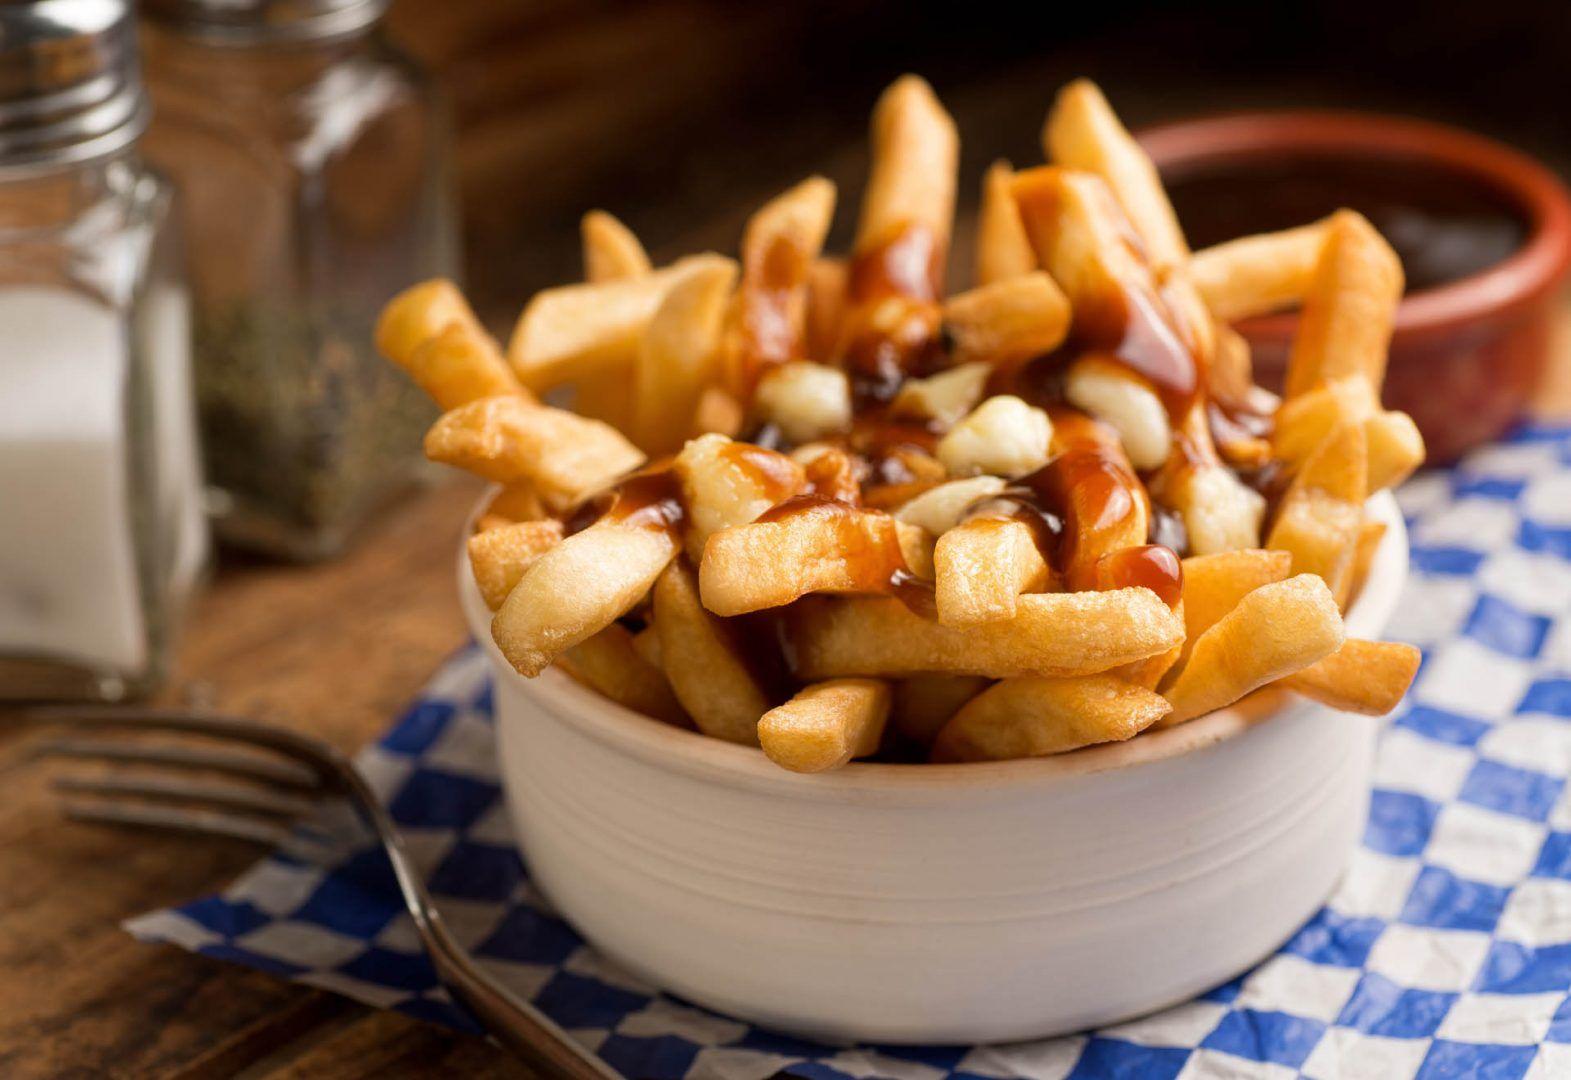 Poutine-Canada-street food mondo street food nel mondo cibo da strada